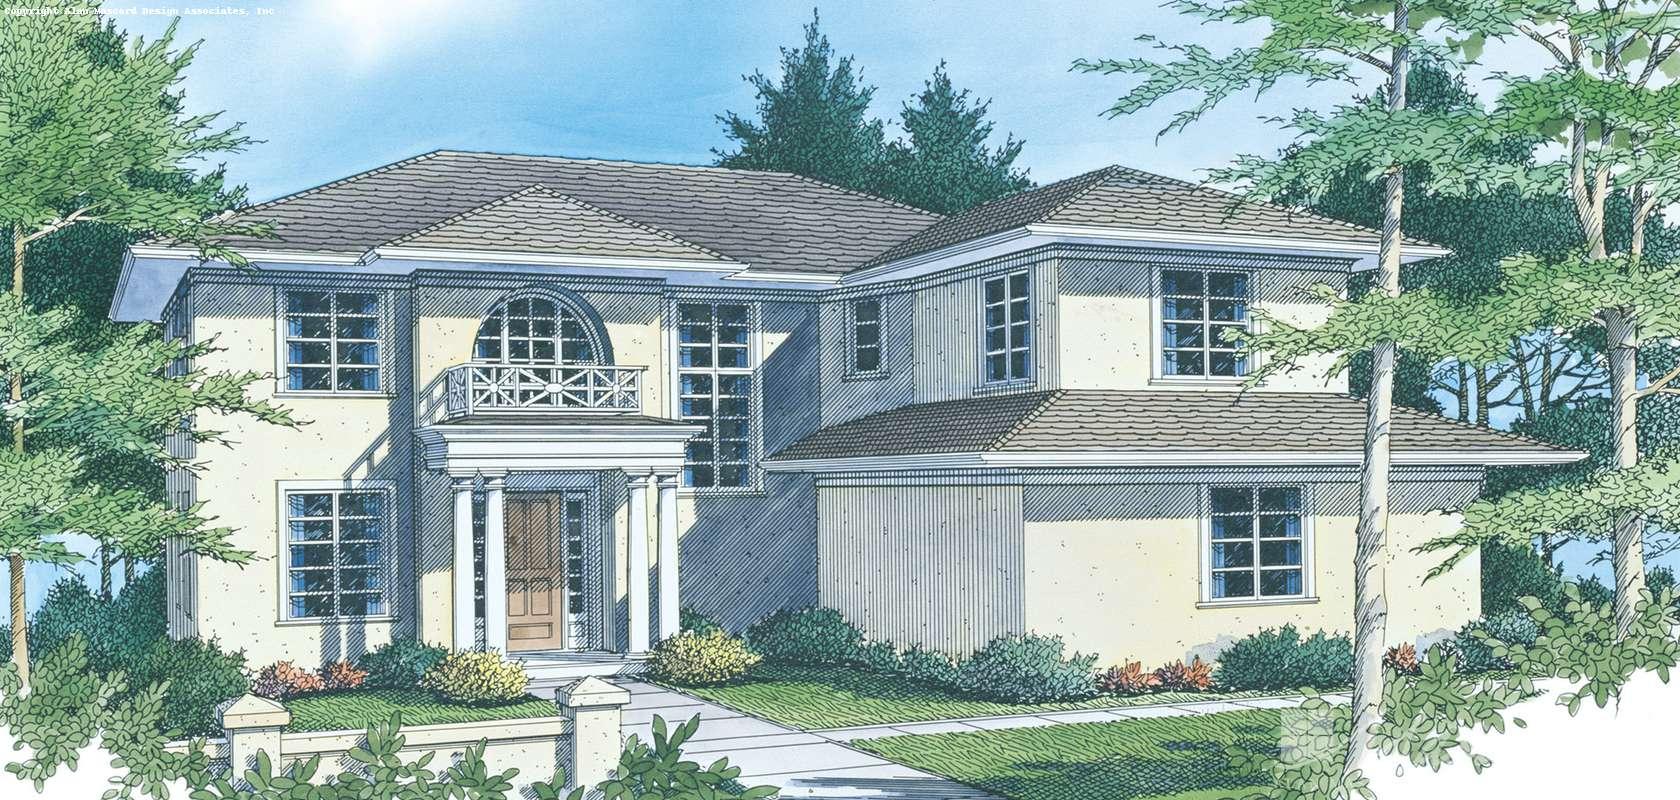 Mascord House Plan B2347: The Gardell